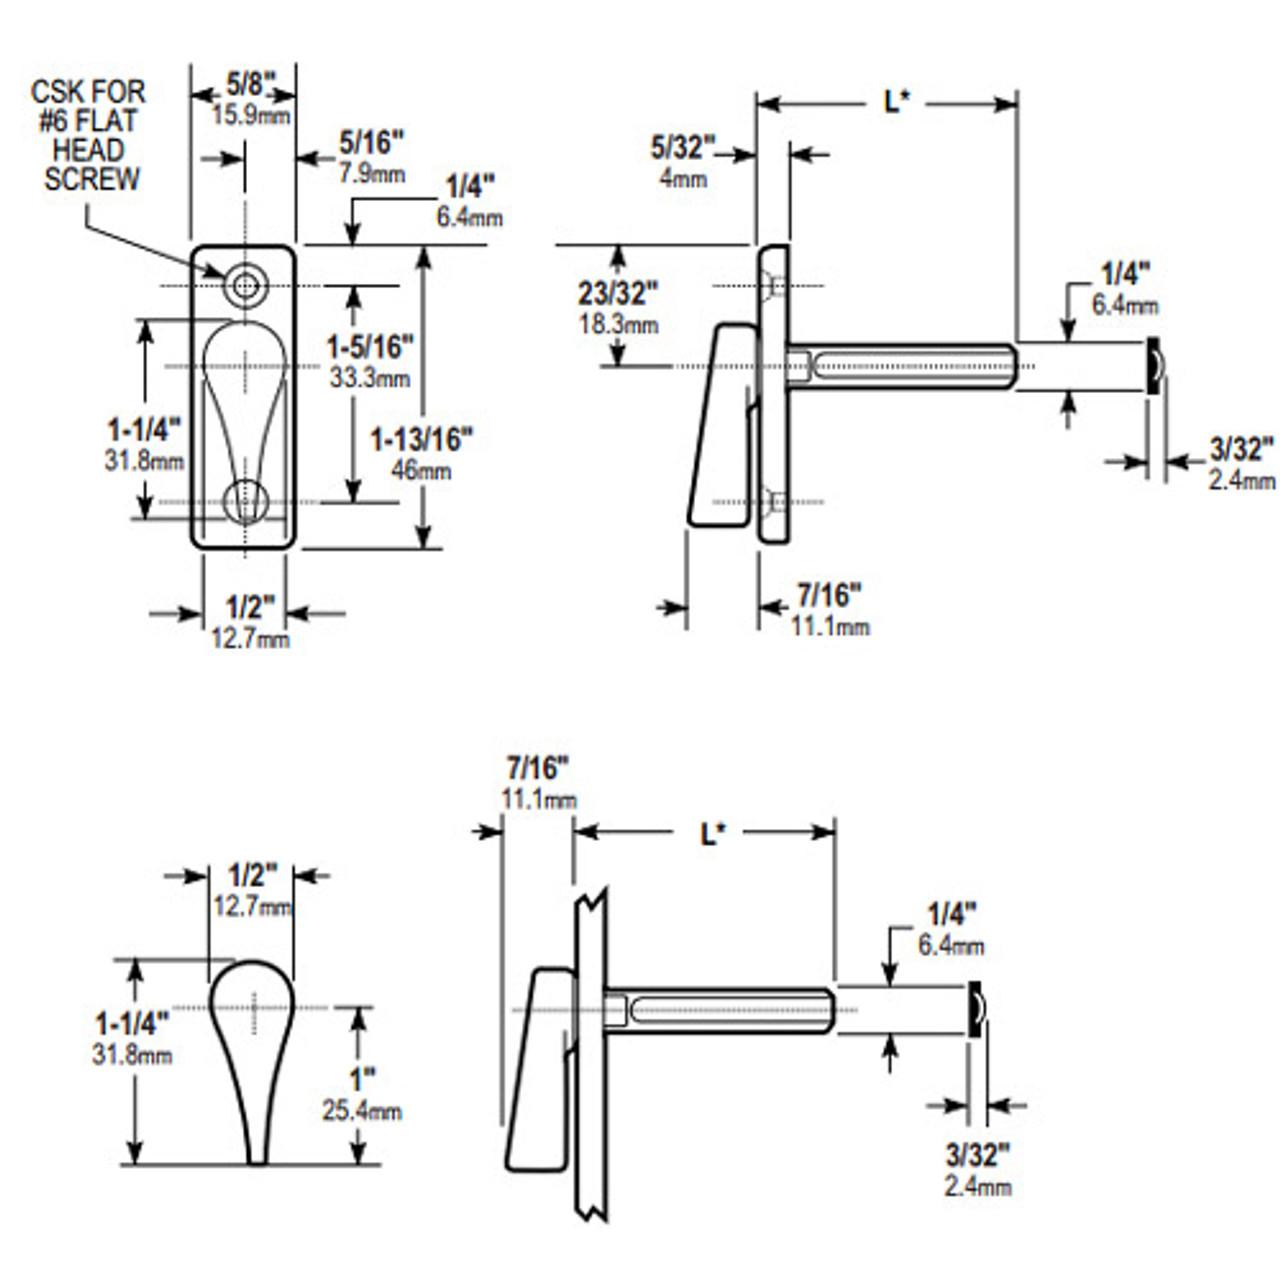 1000-02-29-119 Adams Rite 1000 Series Turns Dimensional View